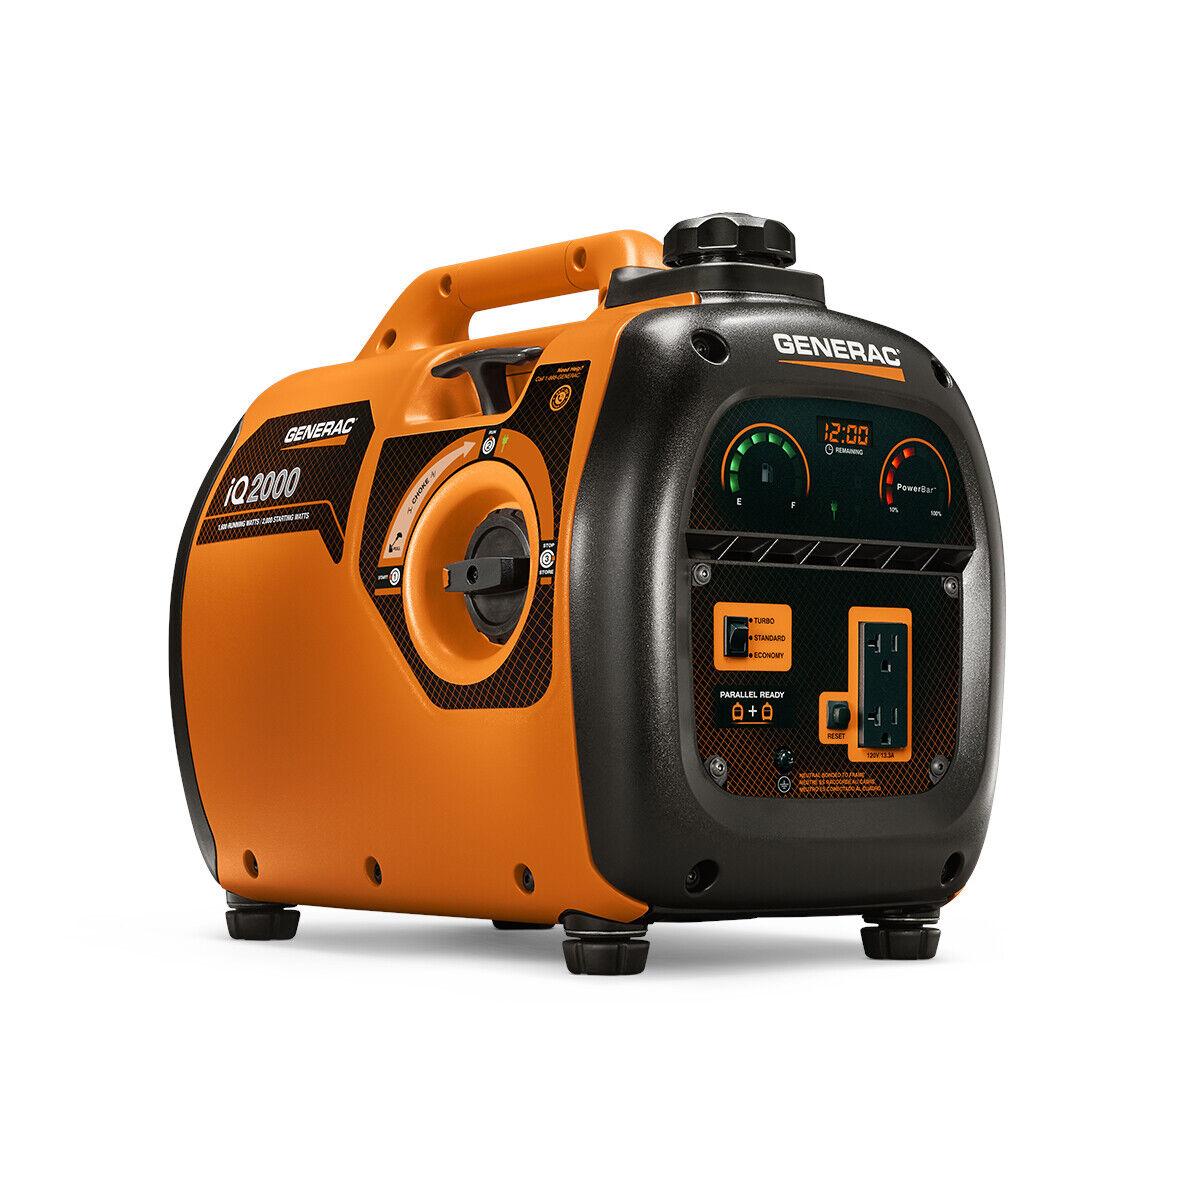 6866 iq2000 2000 watt inverter portable generator